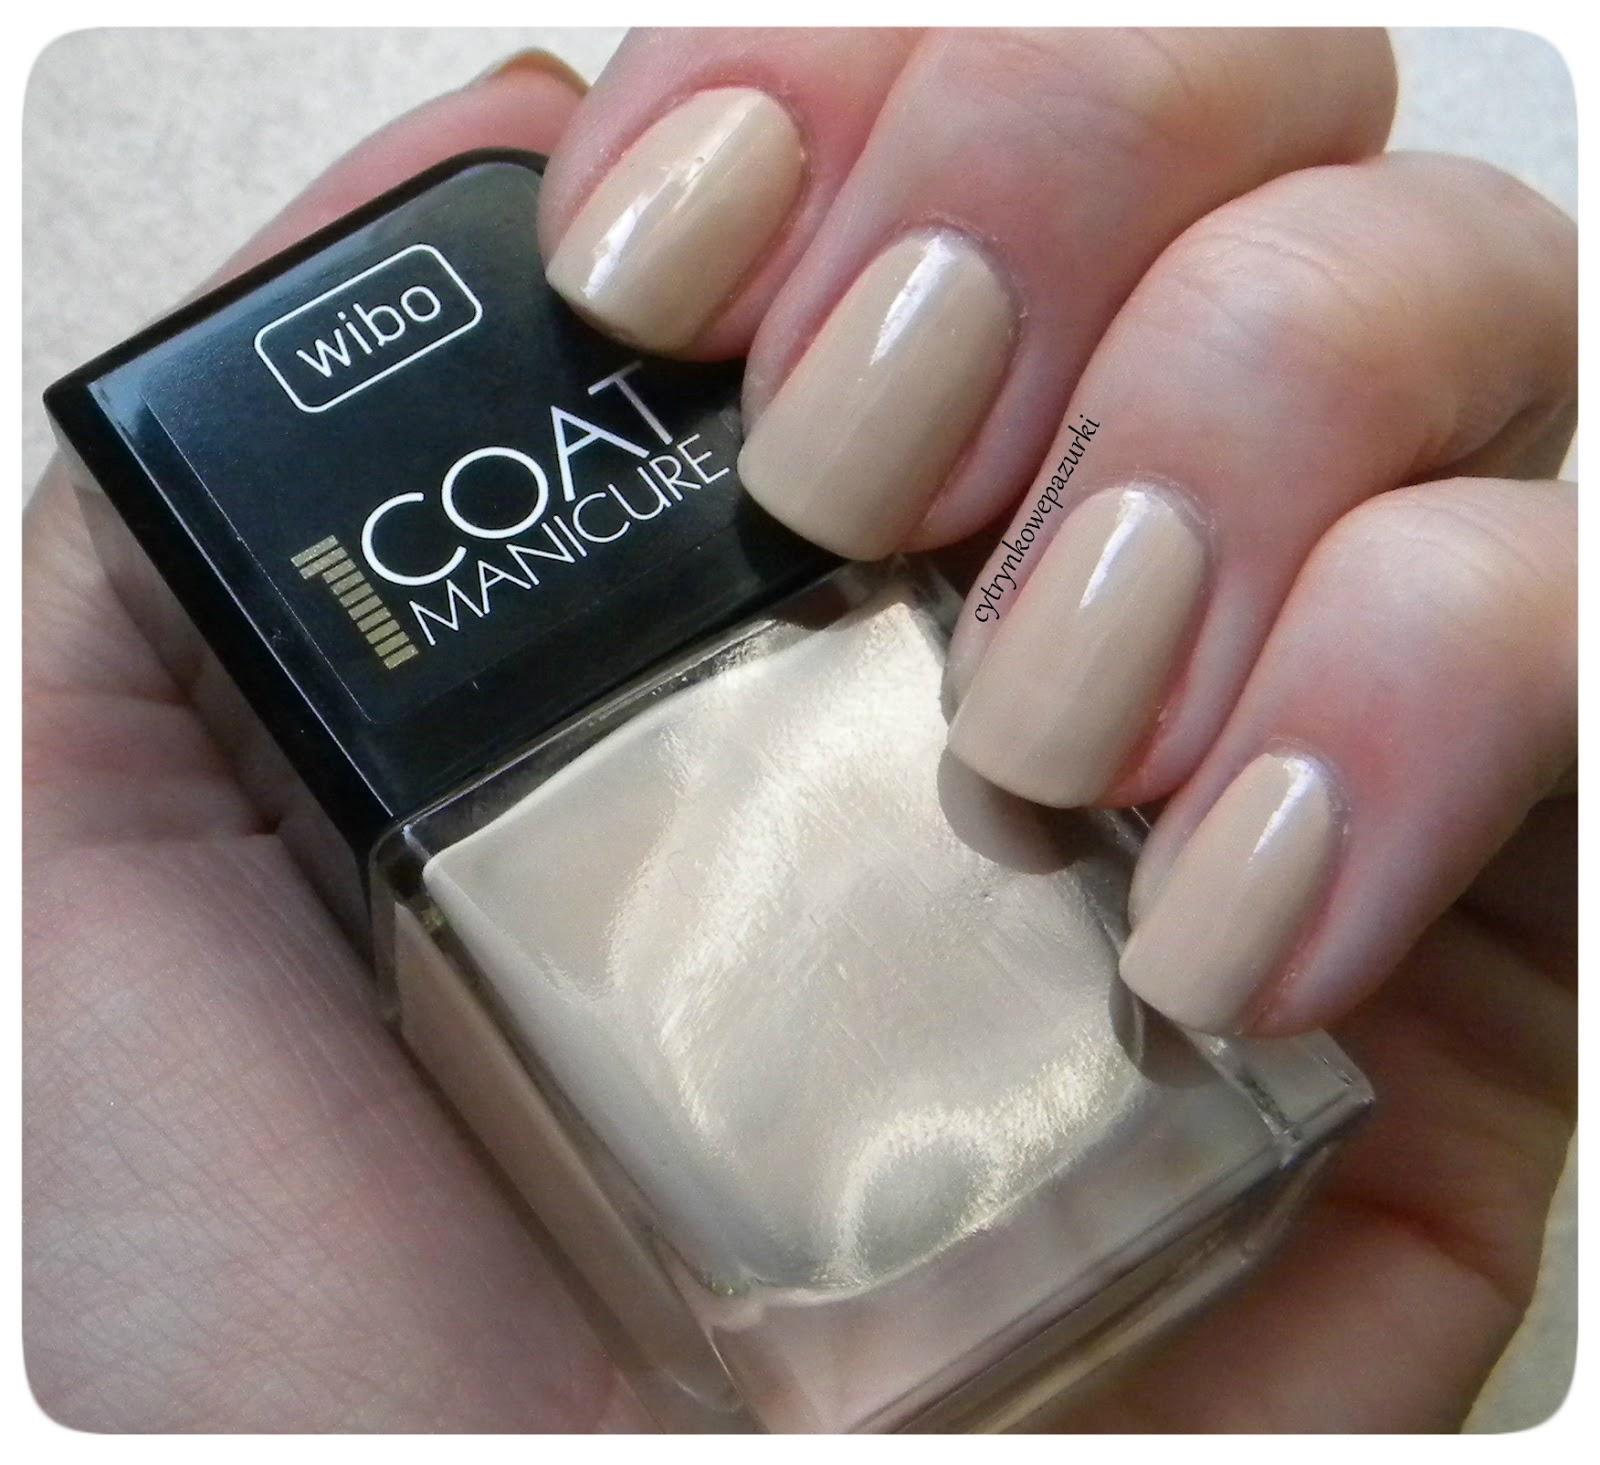 Wibo 1 Coat Manicure nr 18